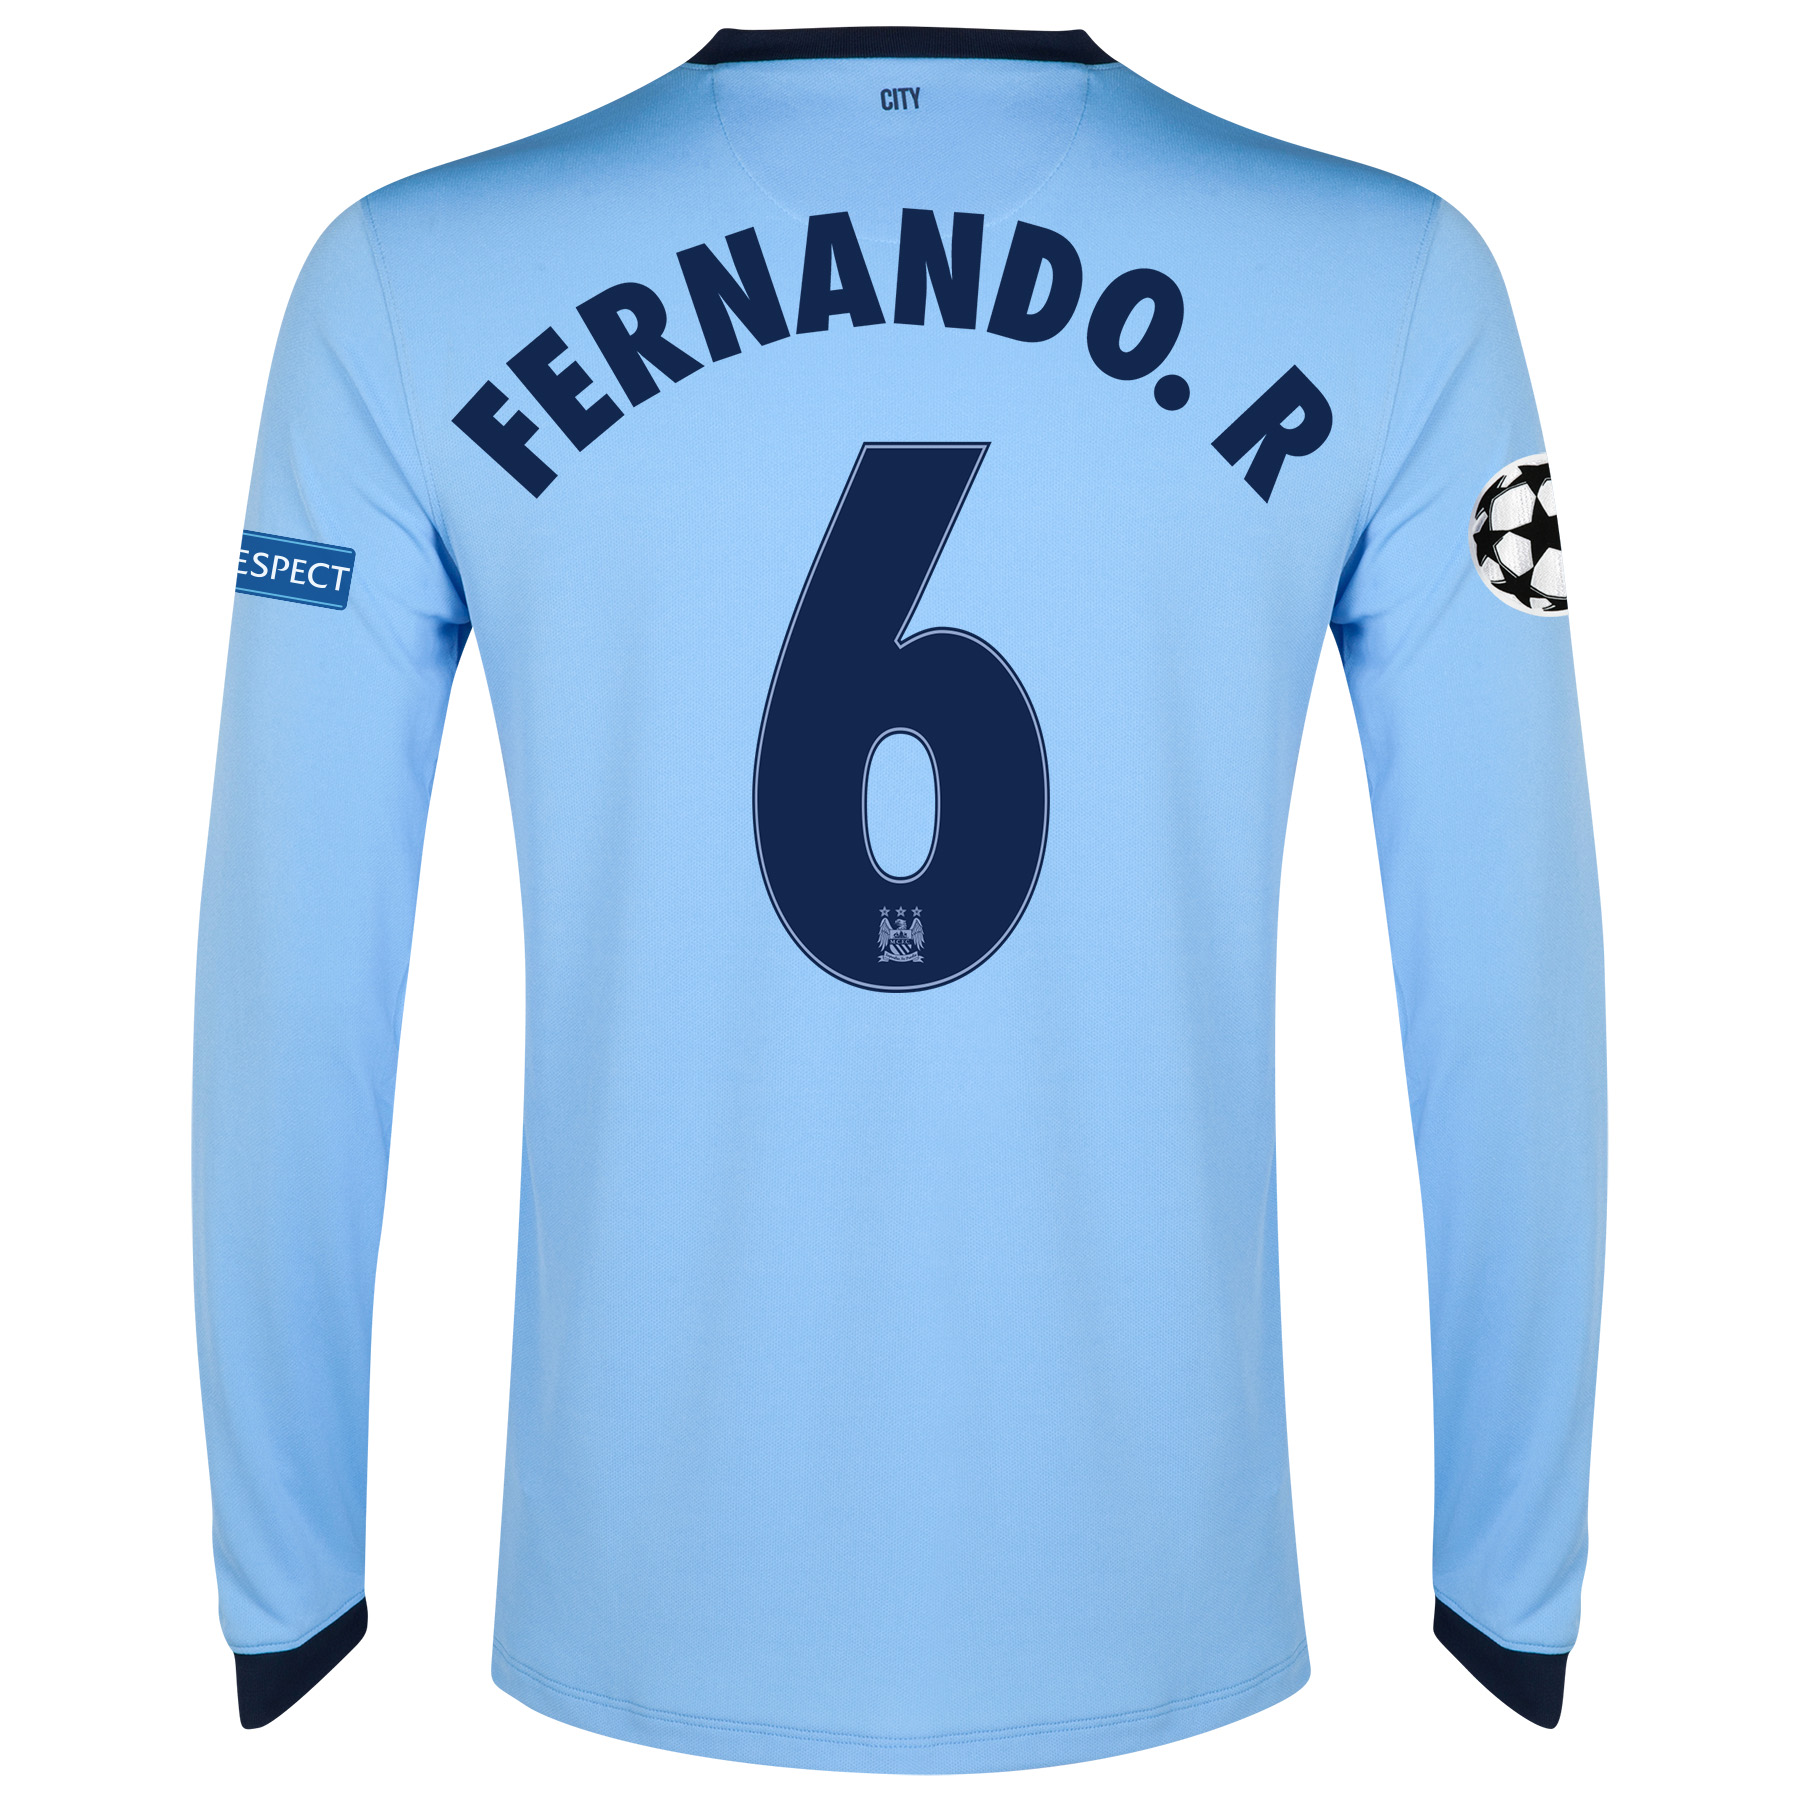 Manchester City UEFA Champions League Home Shirt 2014/15 - Long Sleeve - Kids Sky Blue with Fernando. R 6 printing